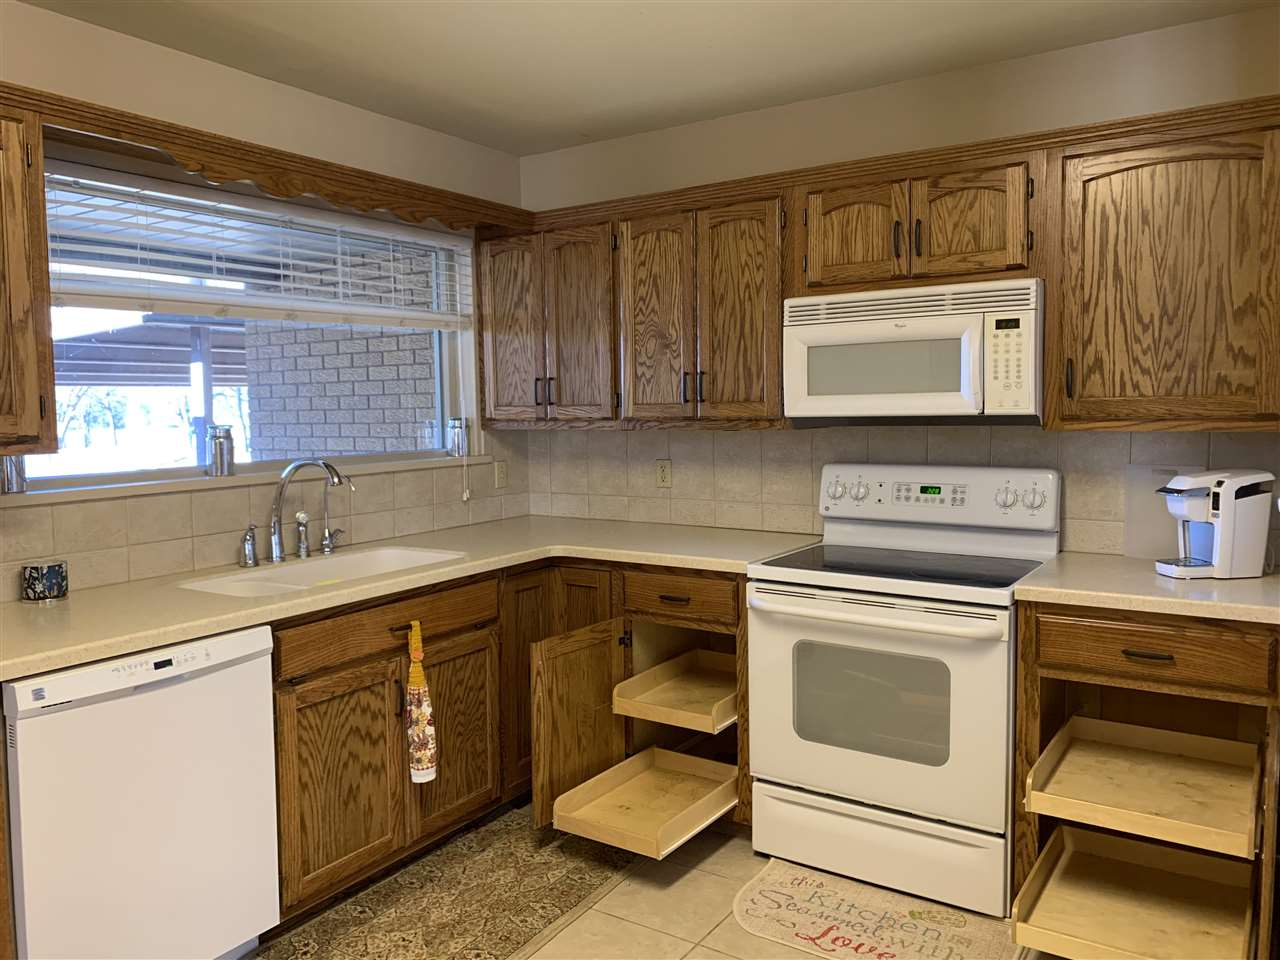 Sold Intraoffice W/MLS | 114 S Peach Newkirk, OK 74647 10